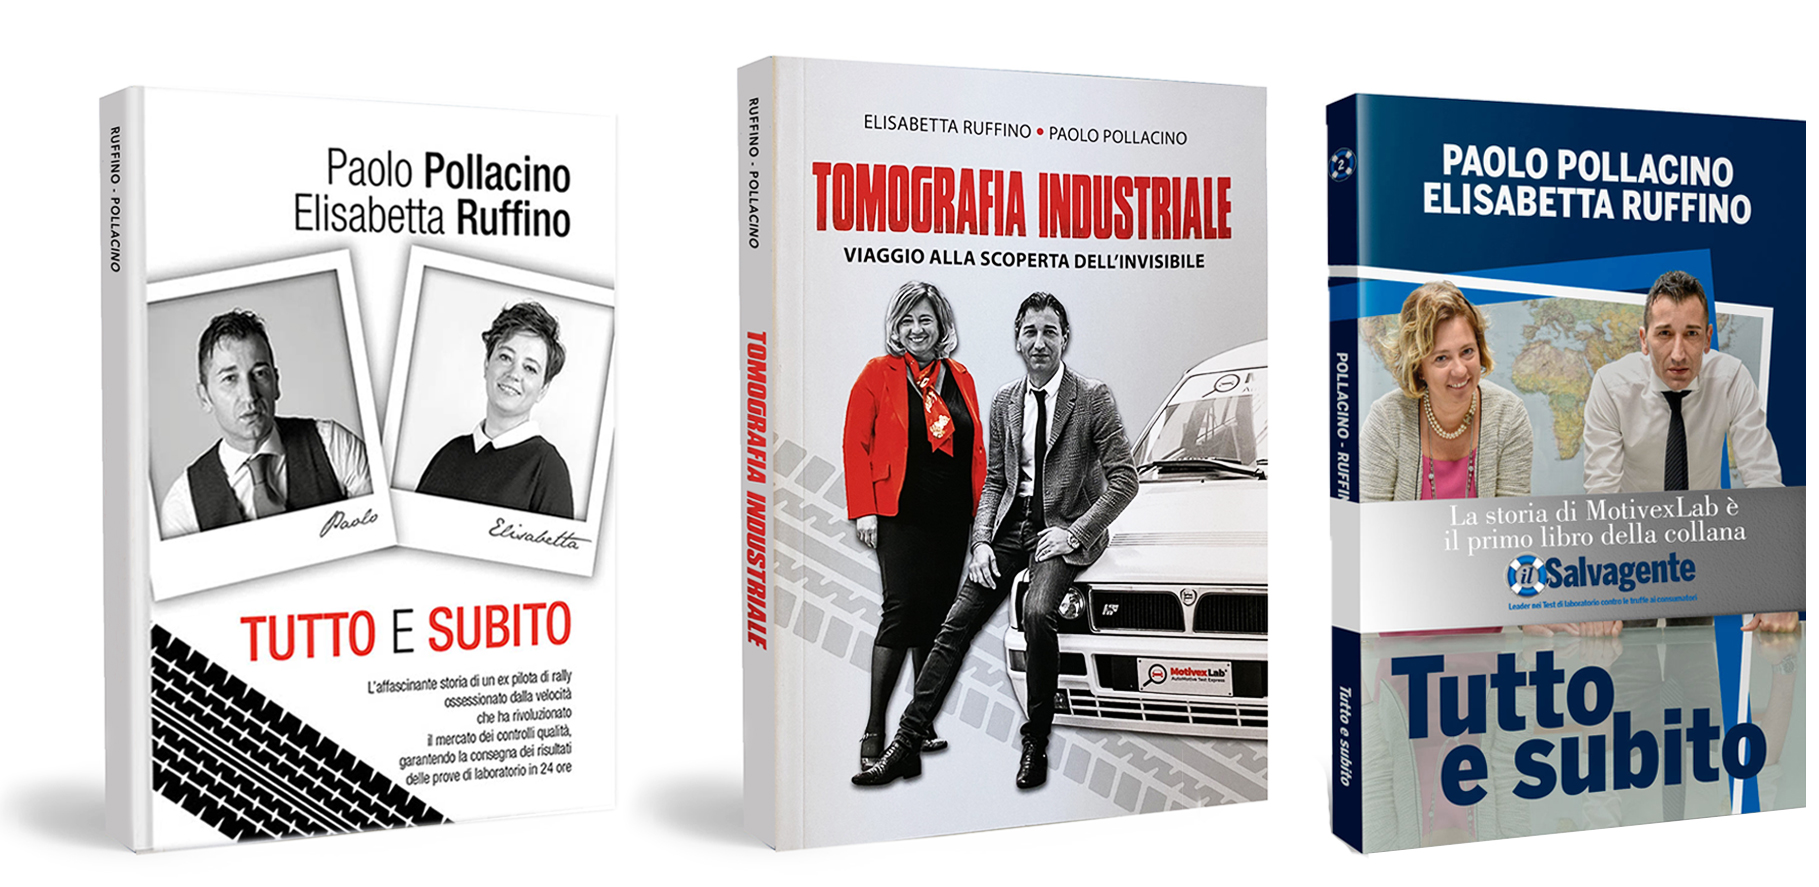 MotivexLab® AutoMotive Test Express i tre libri